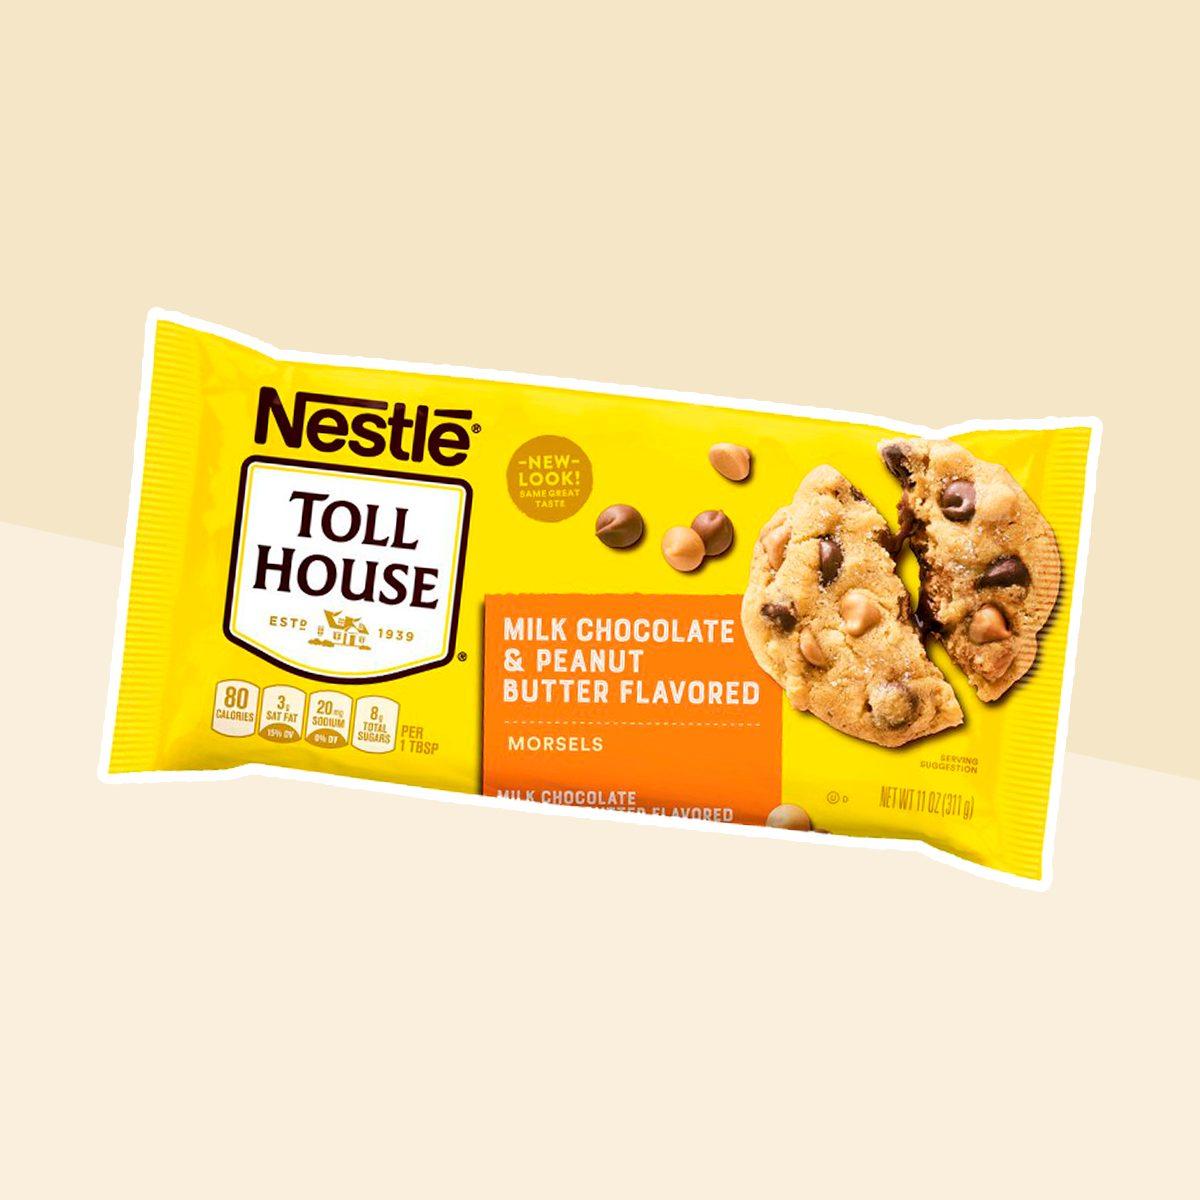 Nestlé Toll House Peanut Butter & Milk Chocolate Morsels